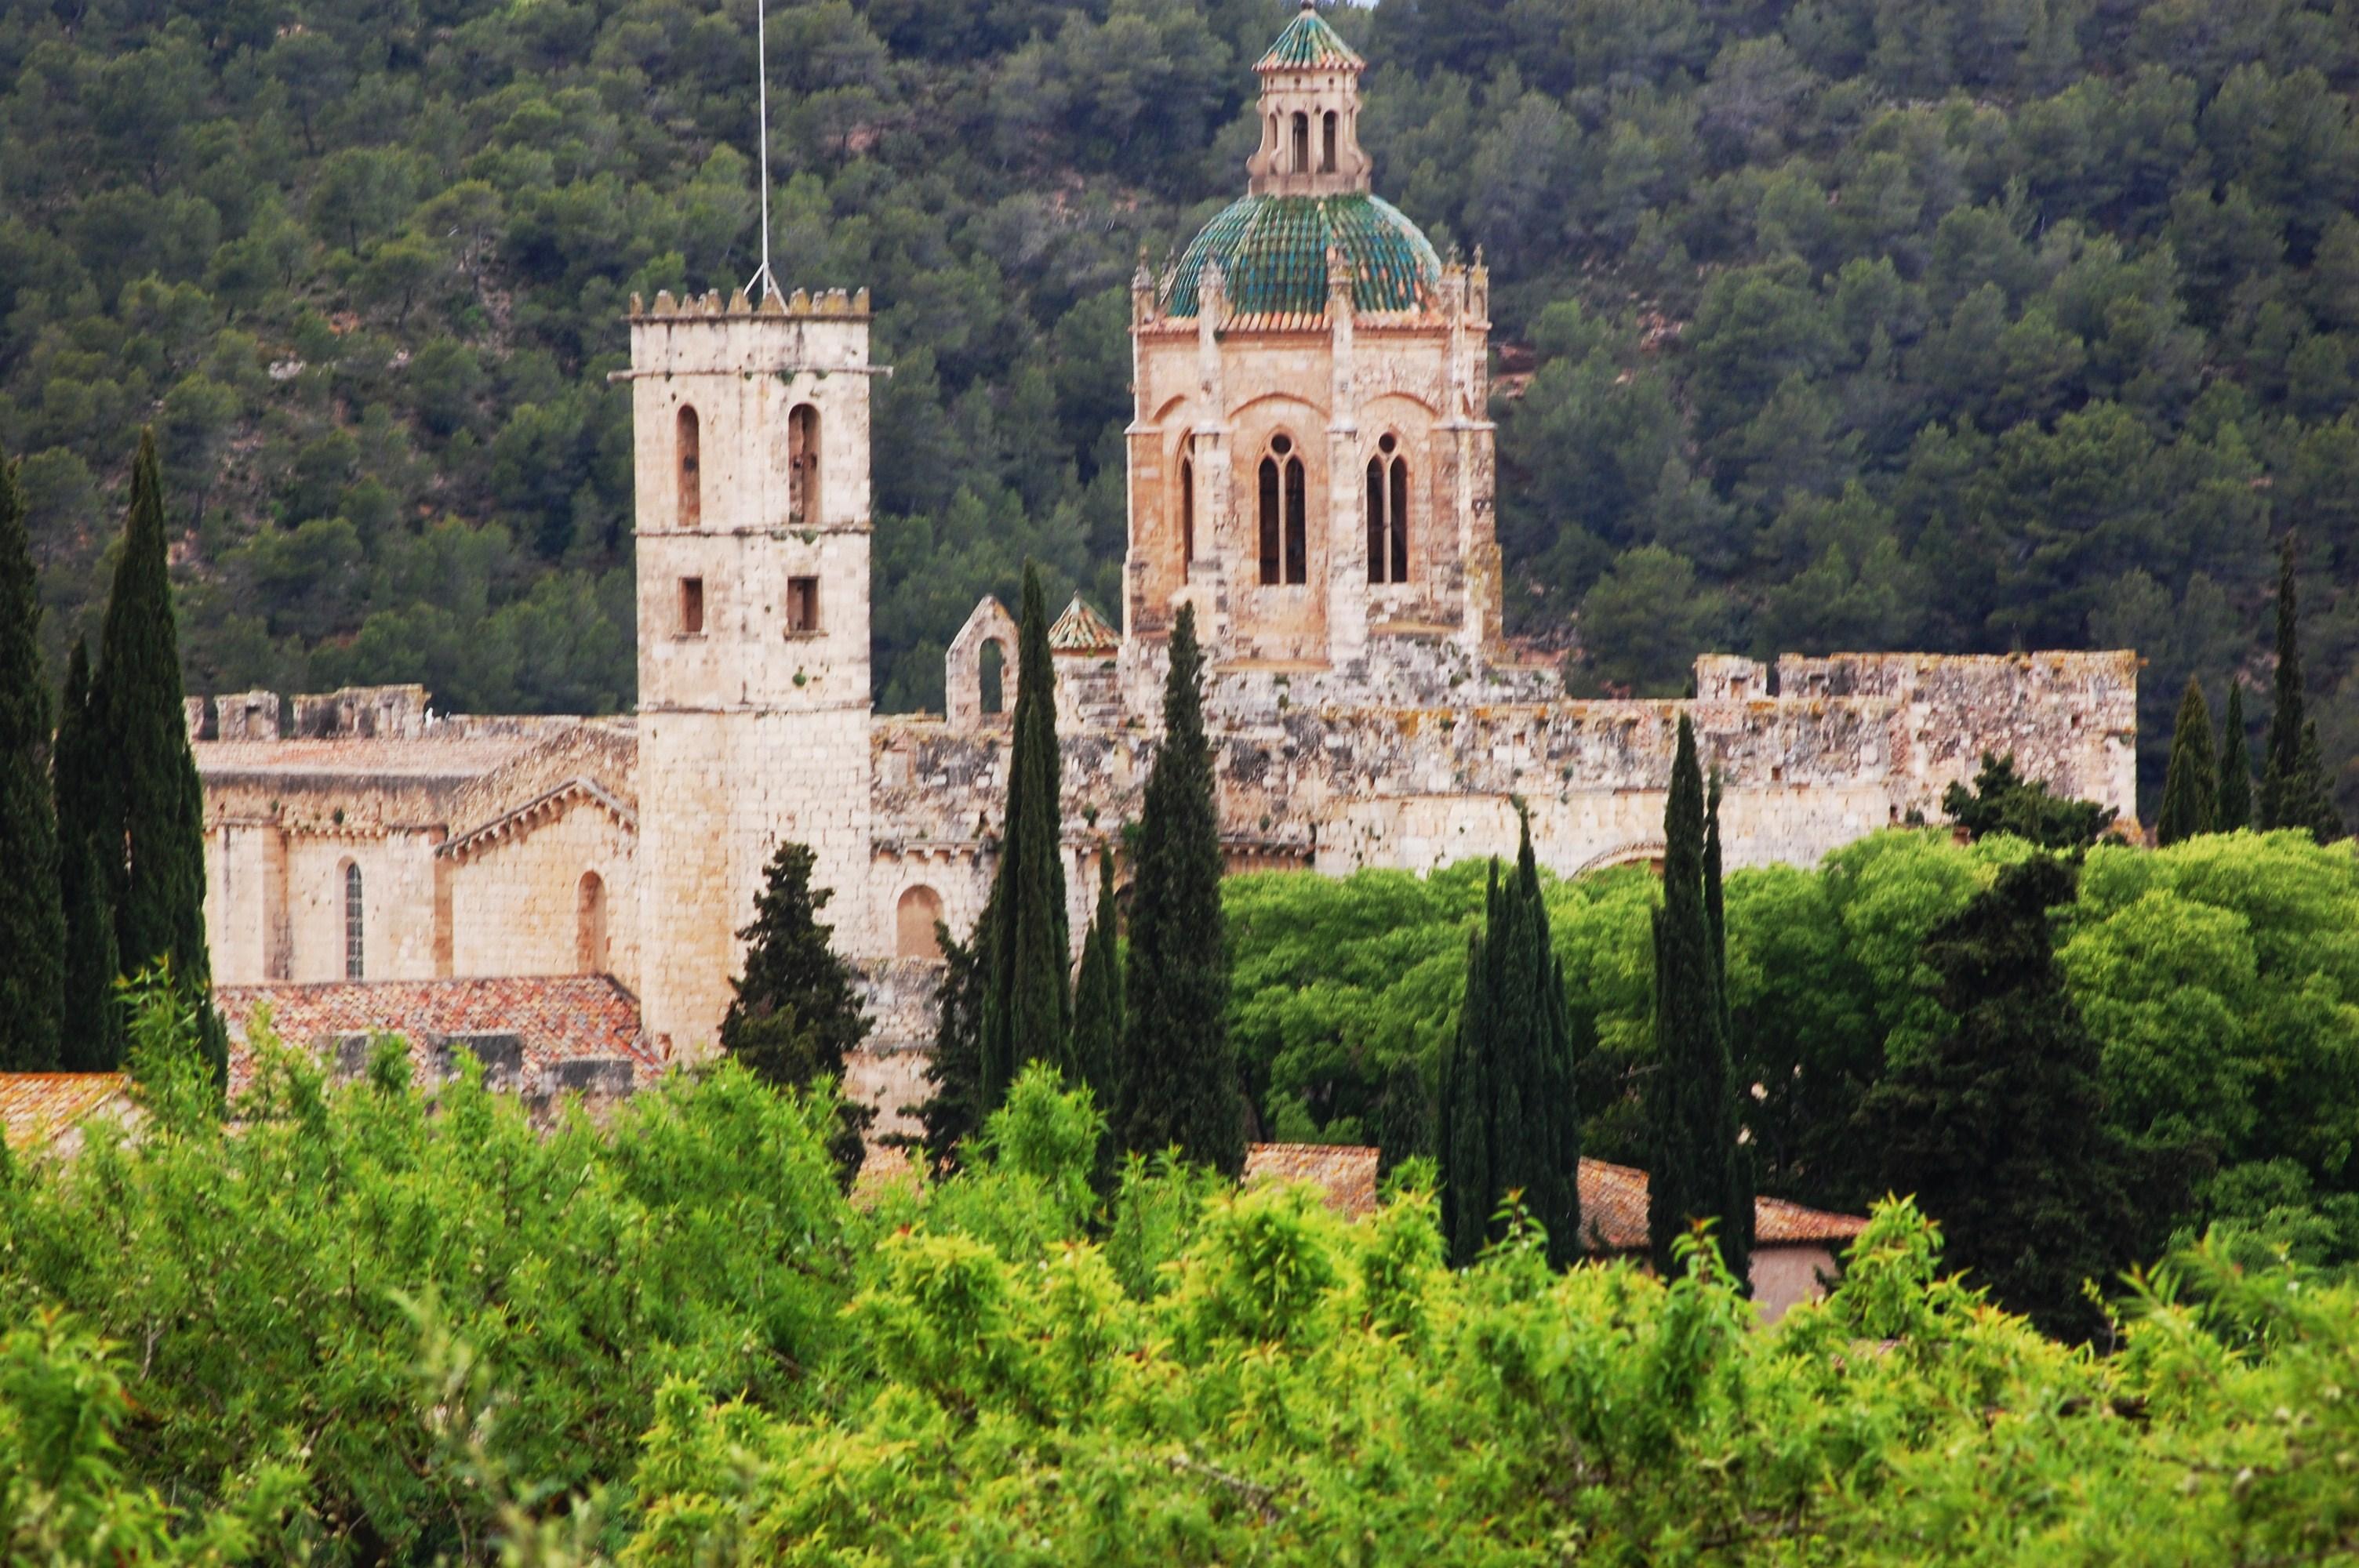 File:Monestir de Santes Creus (Aiguamúrcia) - 36.jpg - Wikimedia Commons